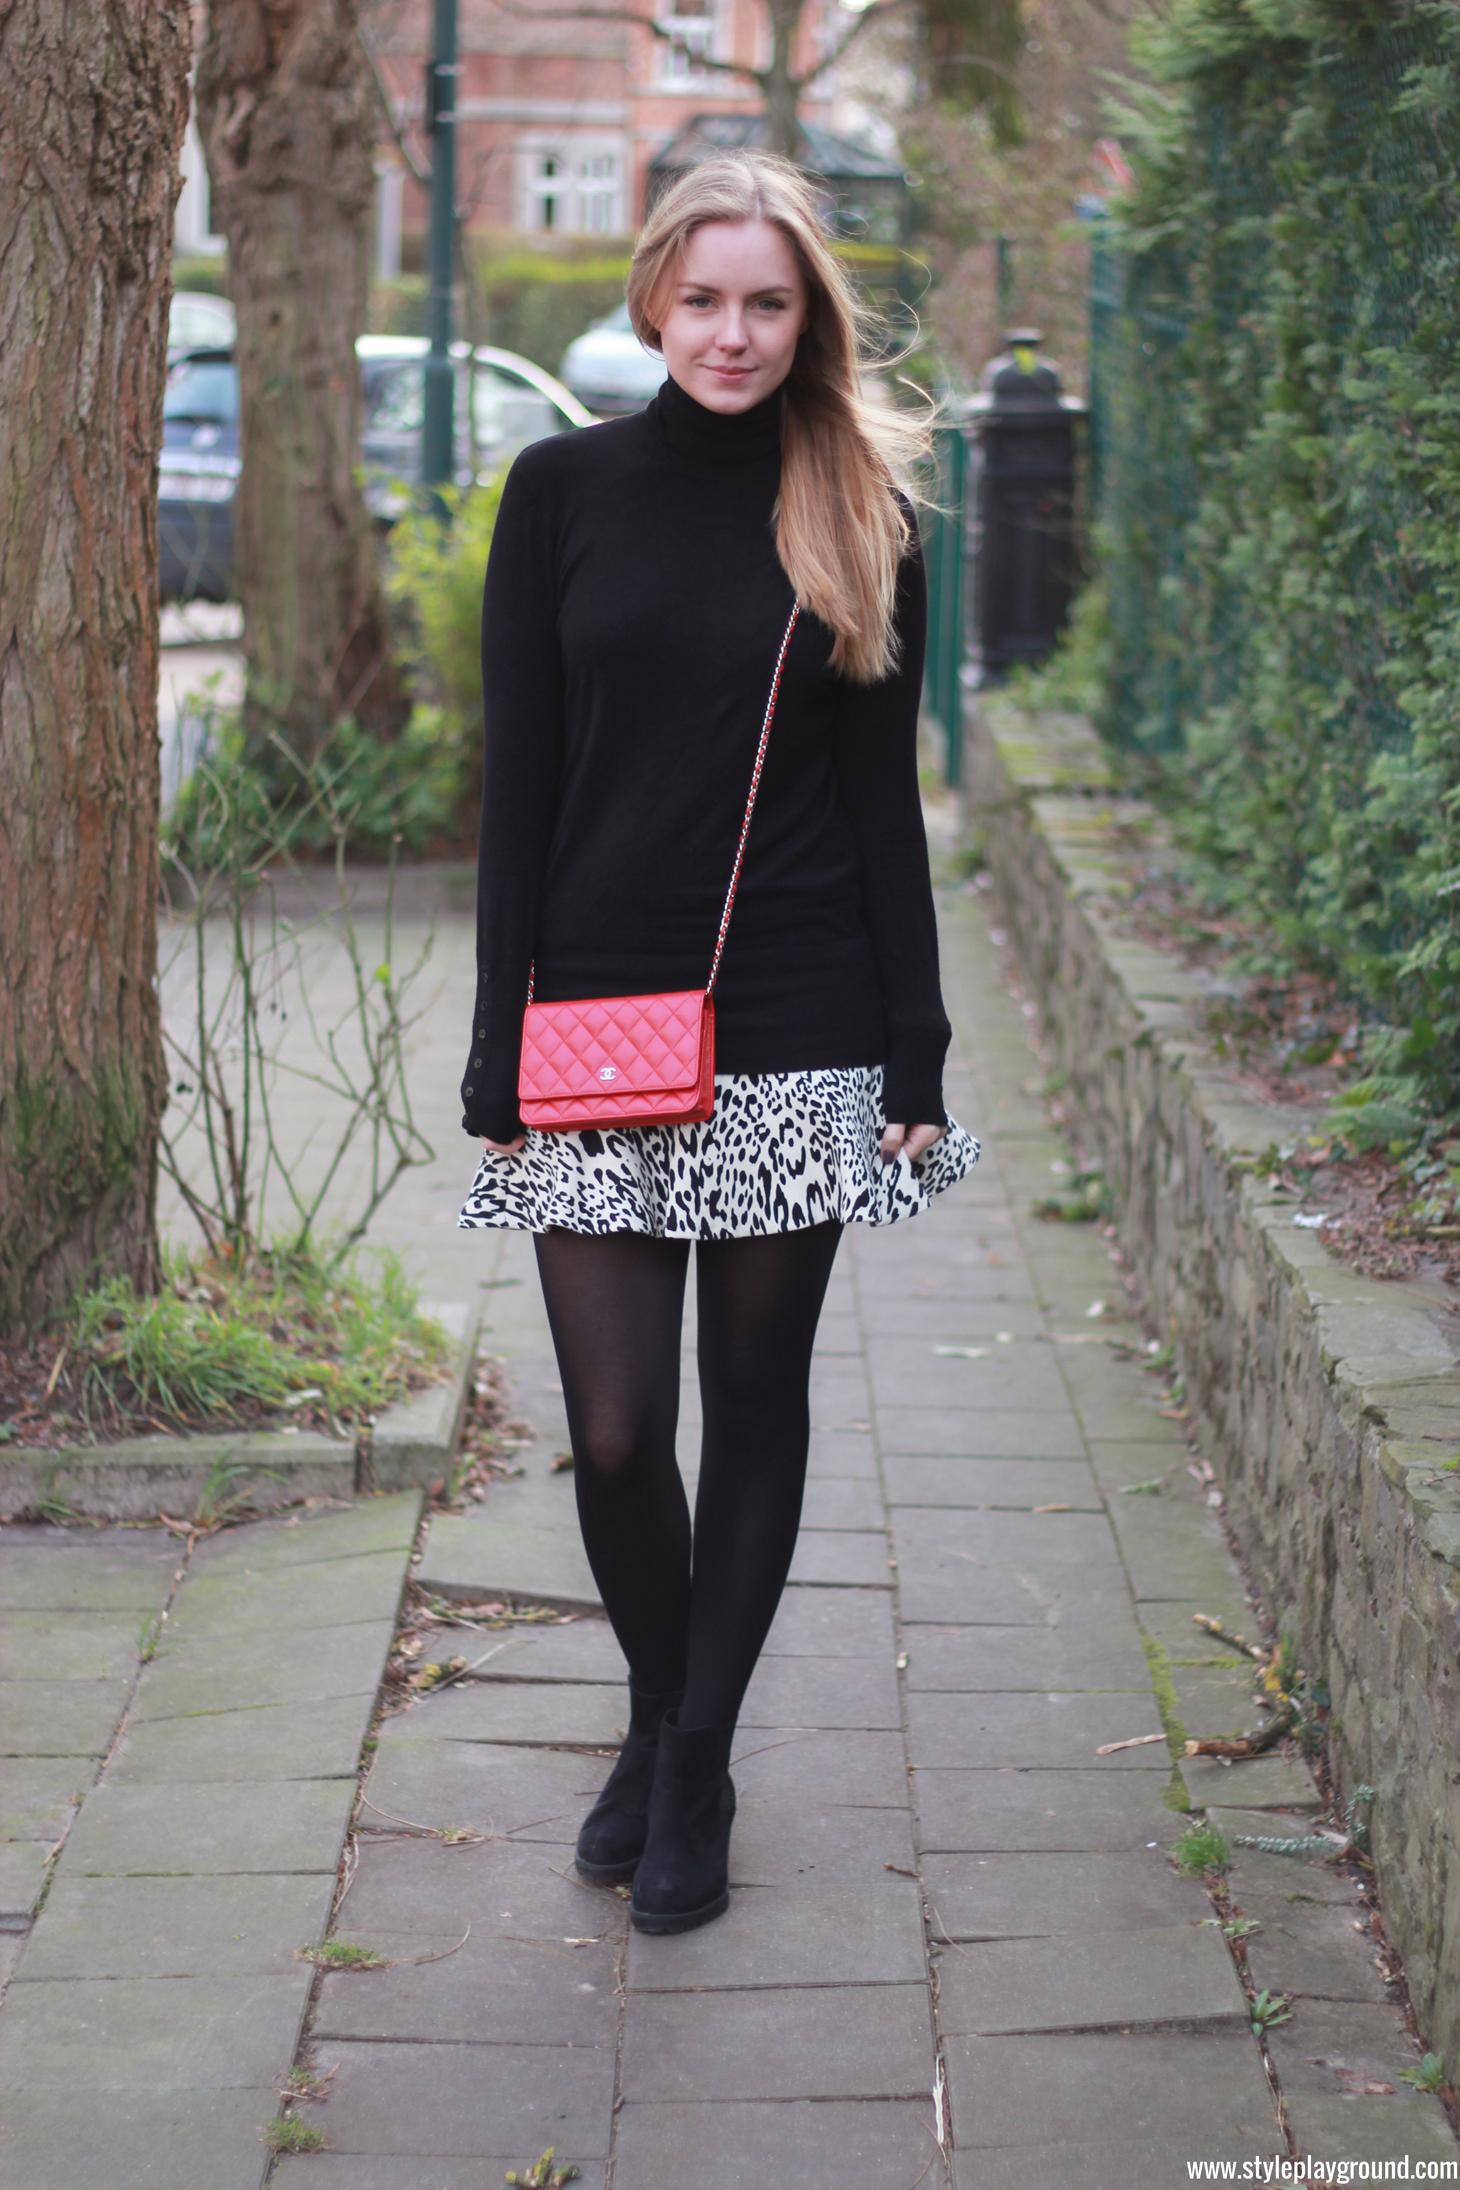 Caught in the wind /// www.styleplayground.com /// Zara jumper & skirt, Chanel wallet on chain & Primark booties